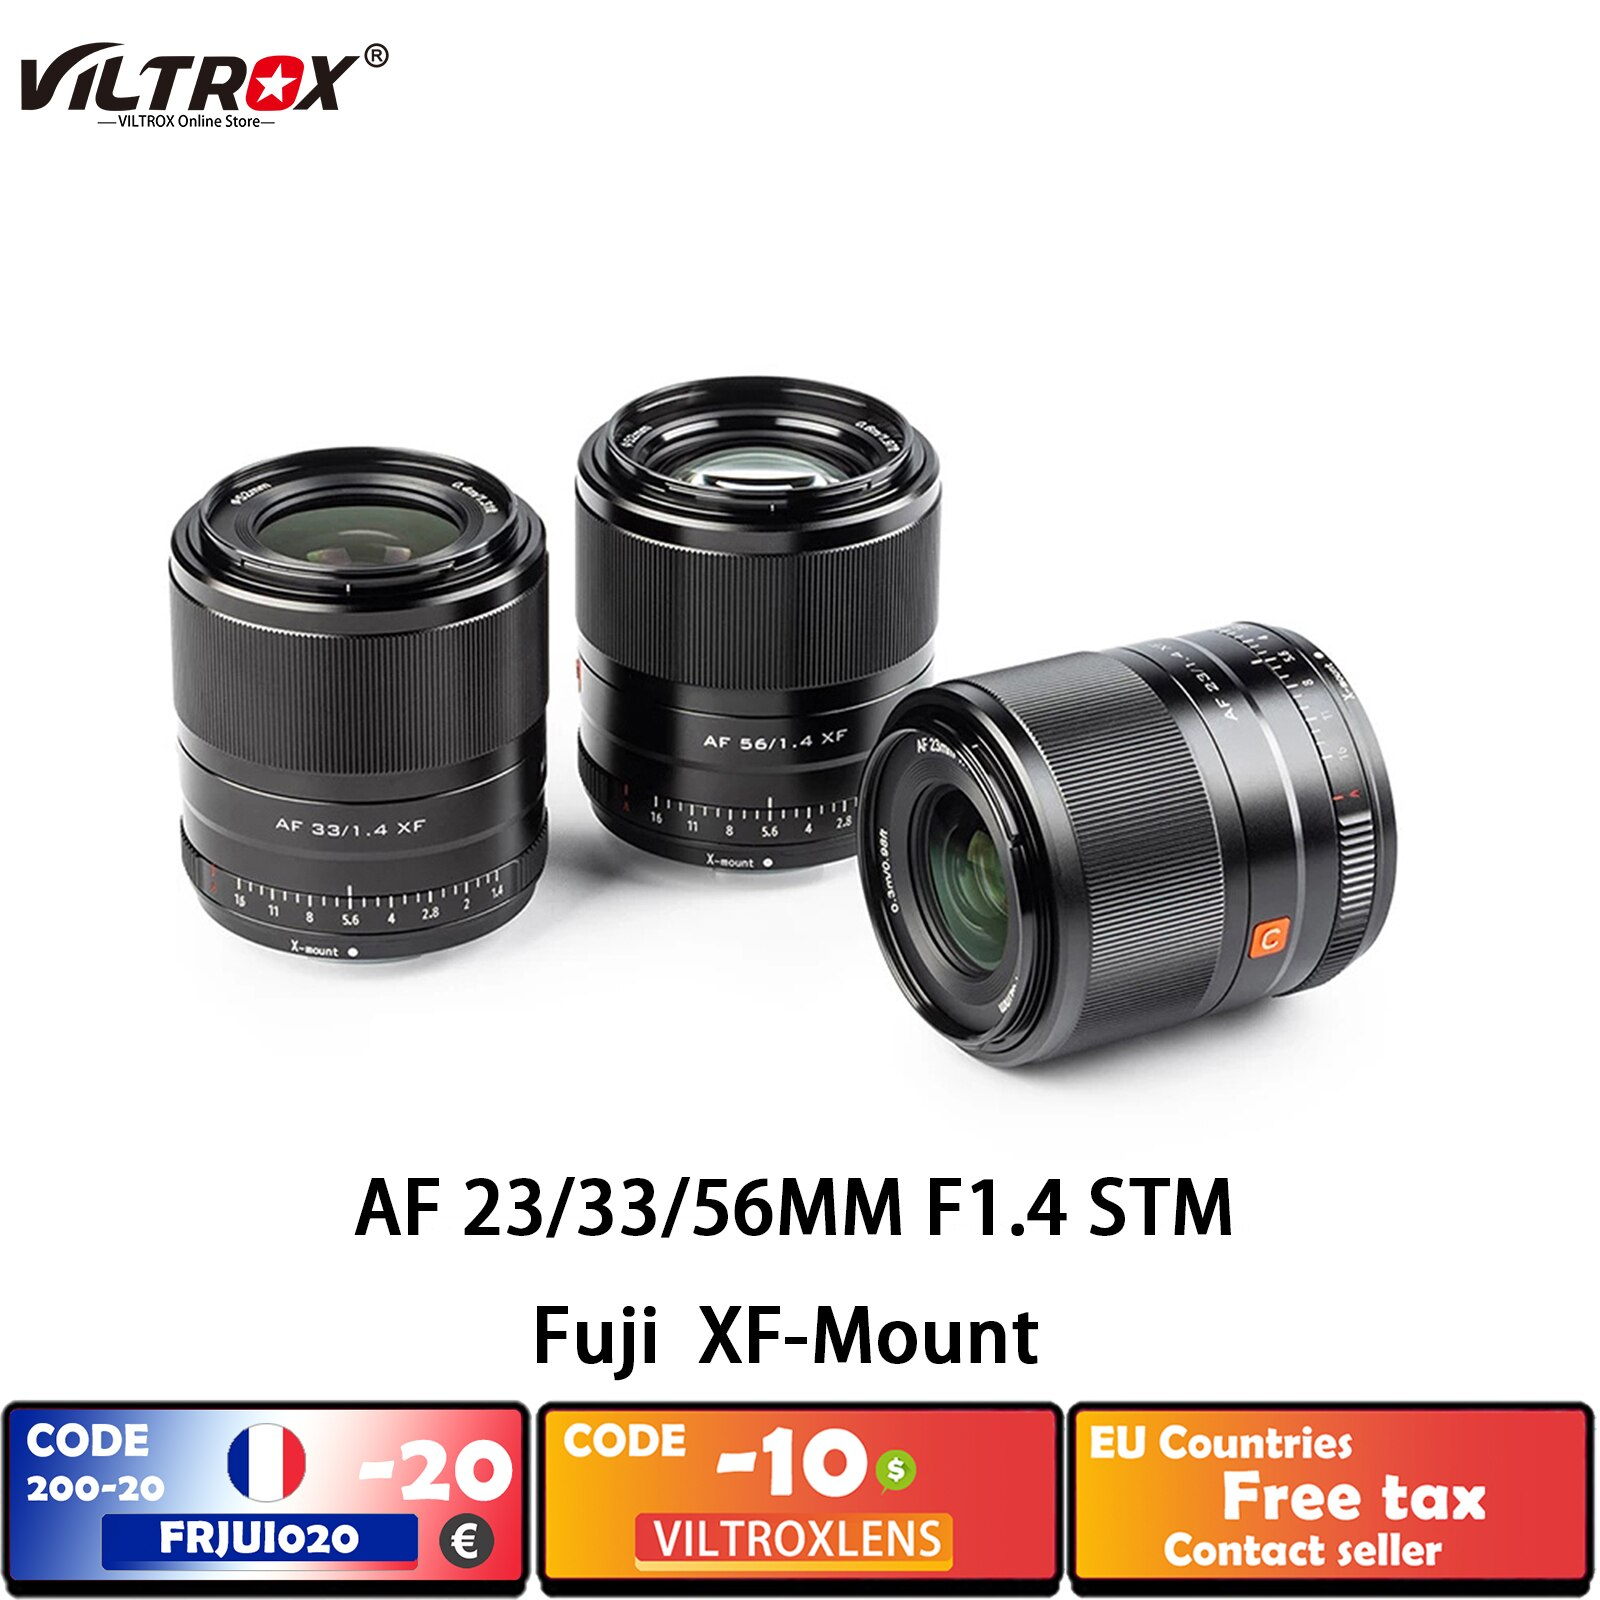 VILTROX 23 мм, 33 мм, 56 мм, F1.4, XF, автофокус, Большая диафрагма, объектив для fujifilm fuji X, штатив для фотоаппарата X20, T30, X-Pro2